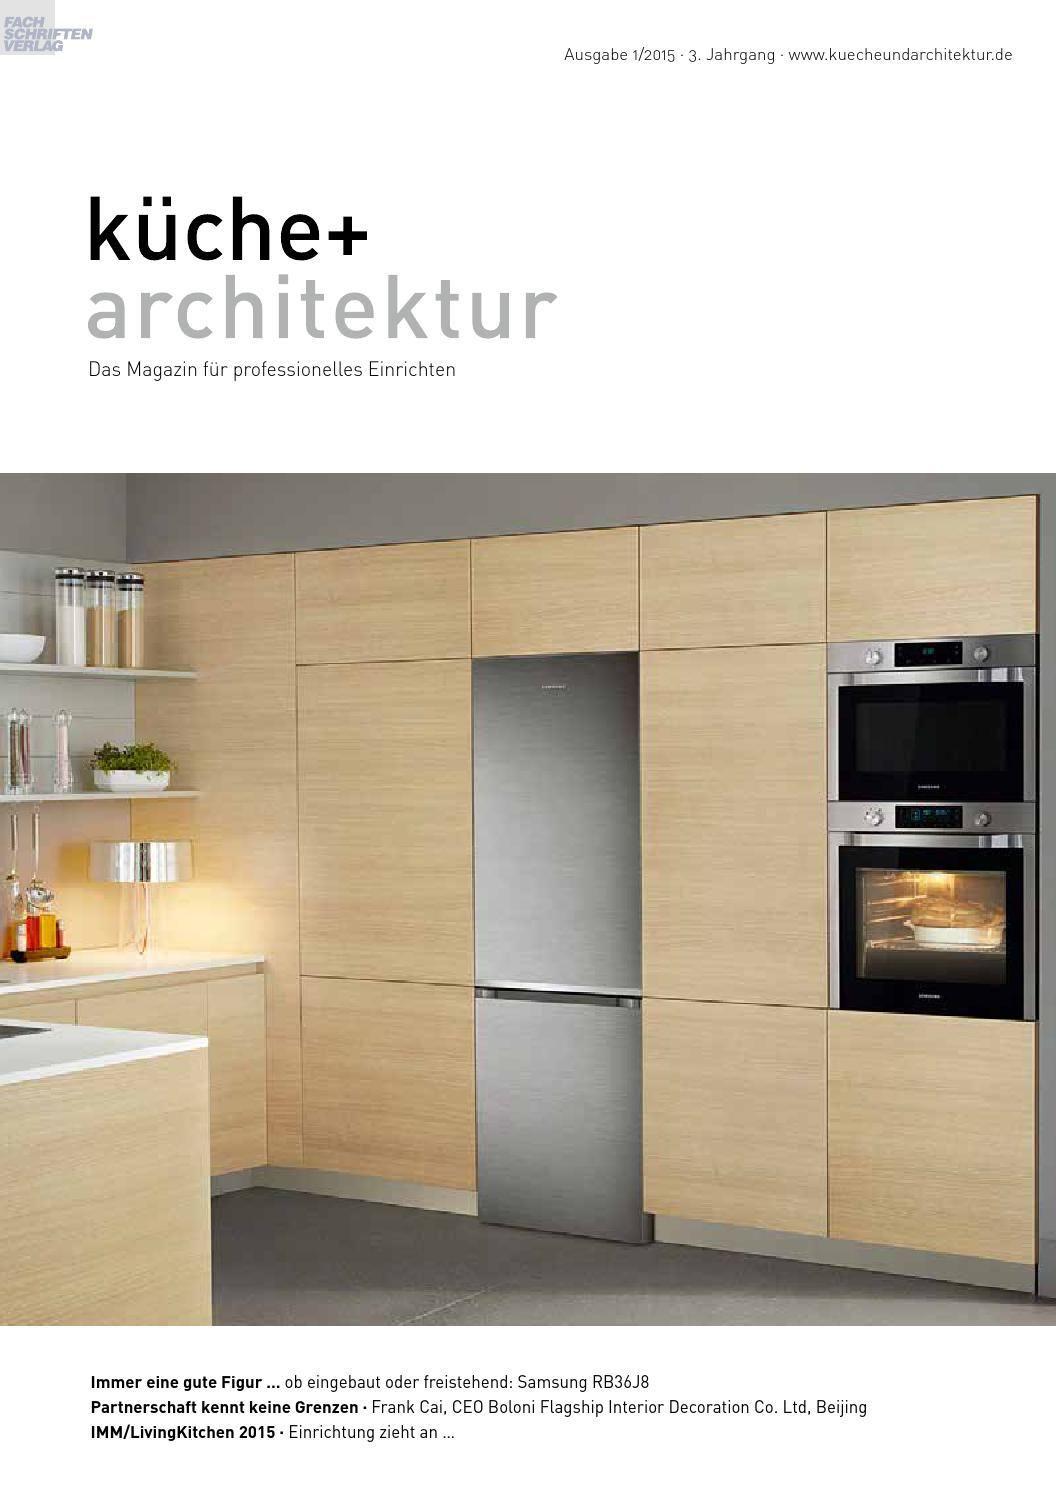 Tolle Zentralküche Nj Ideen - Küchen Design Ideen - vietnamdep.info